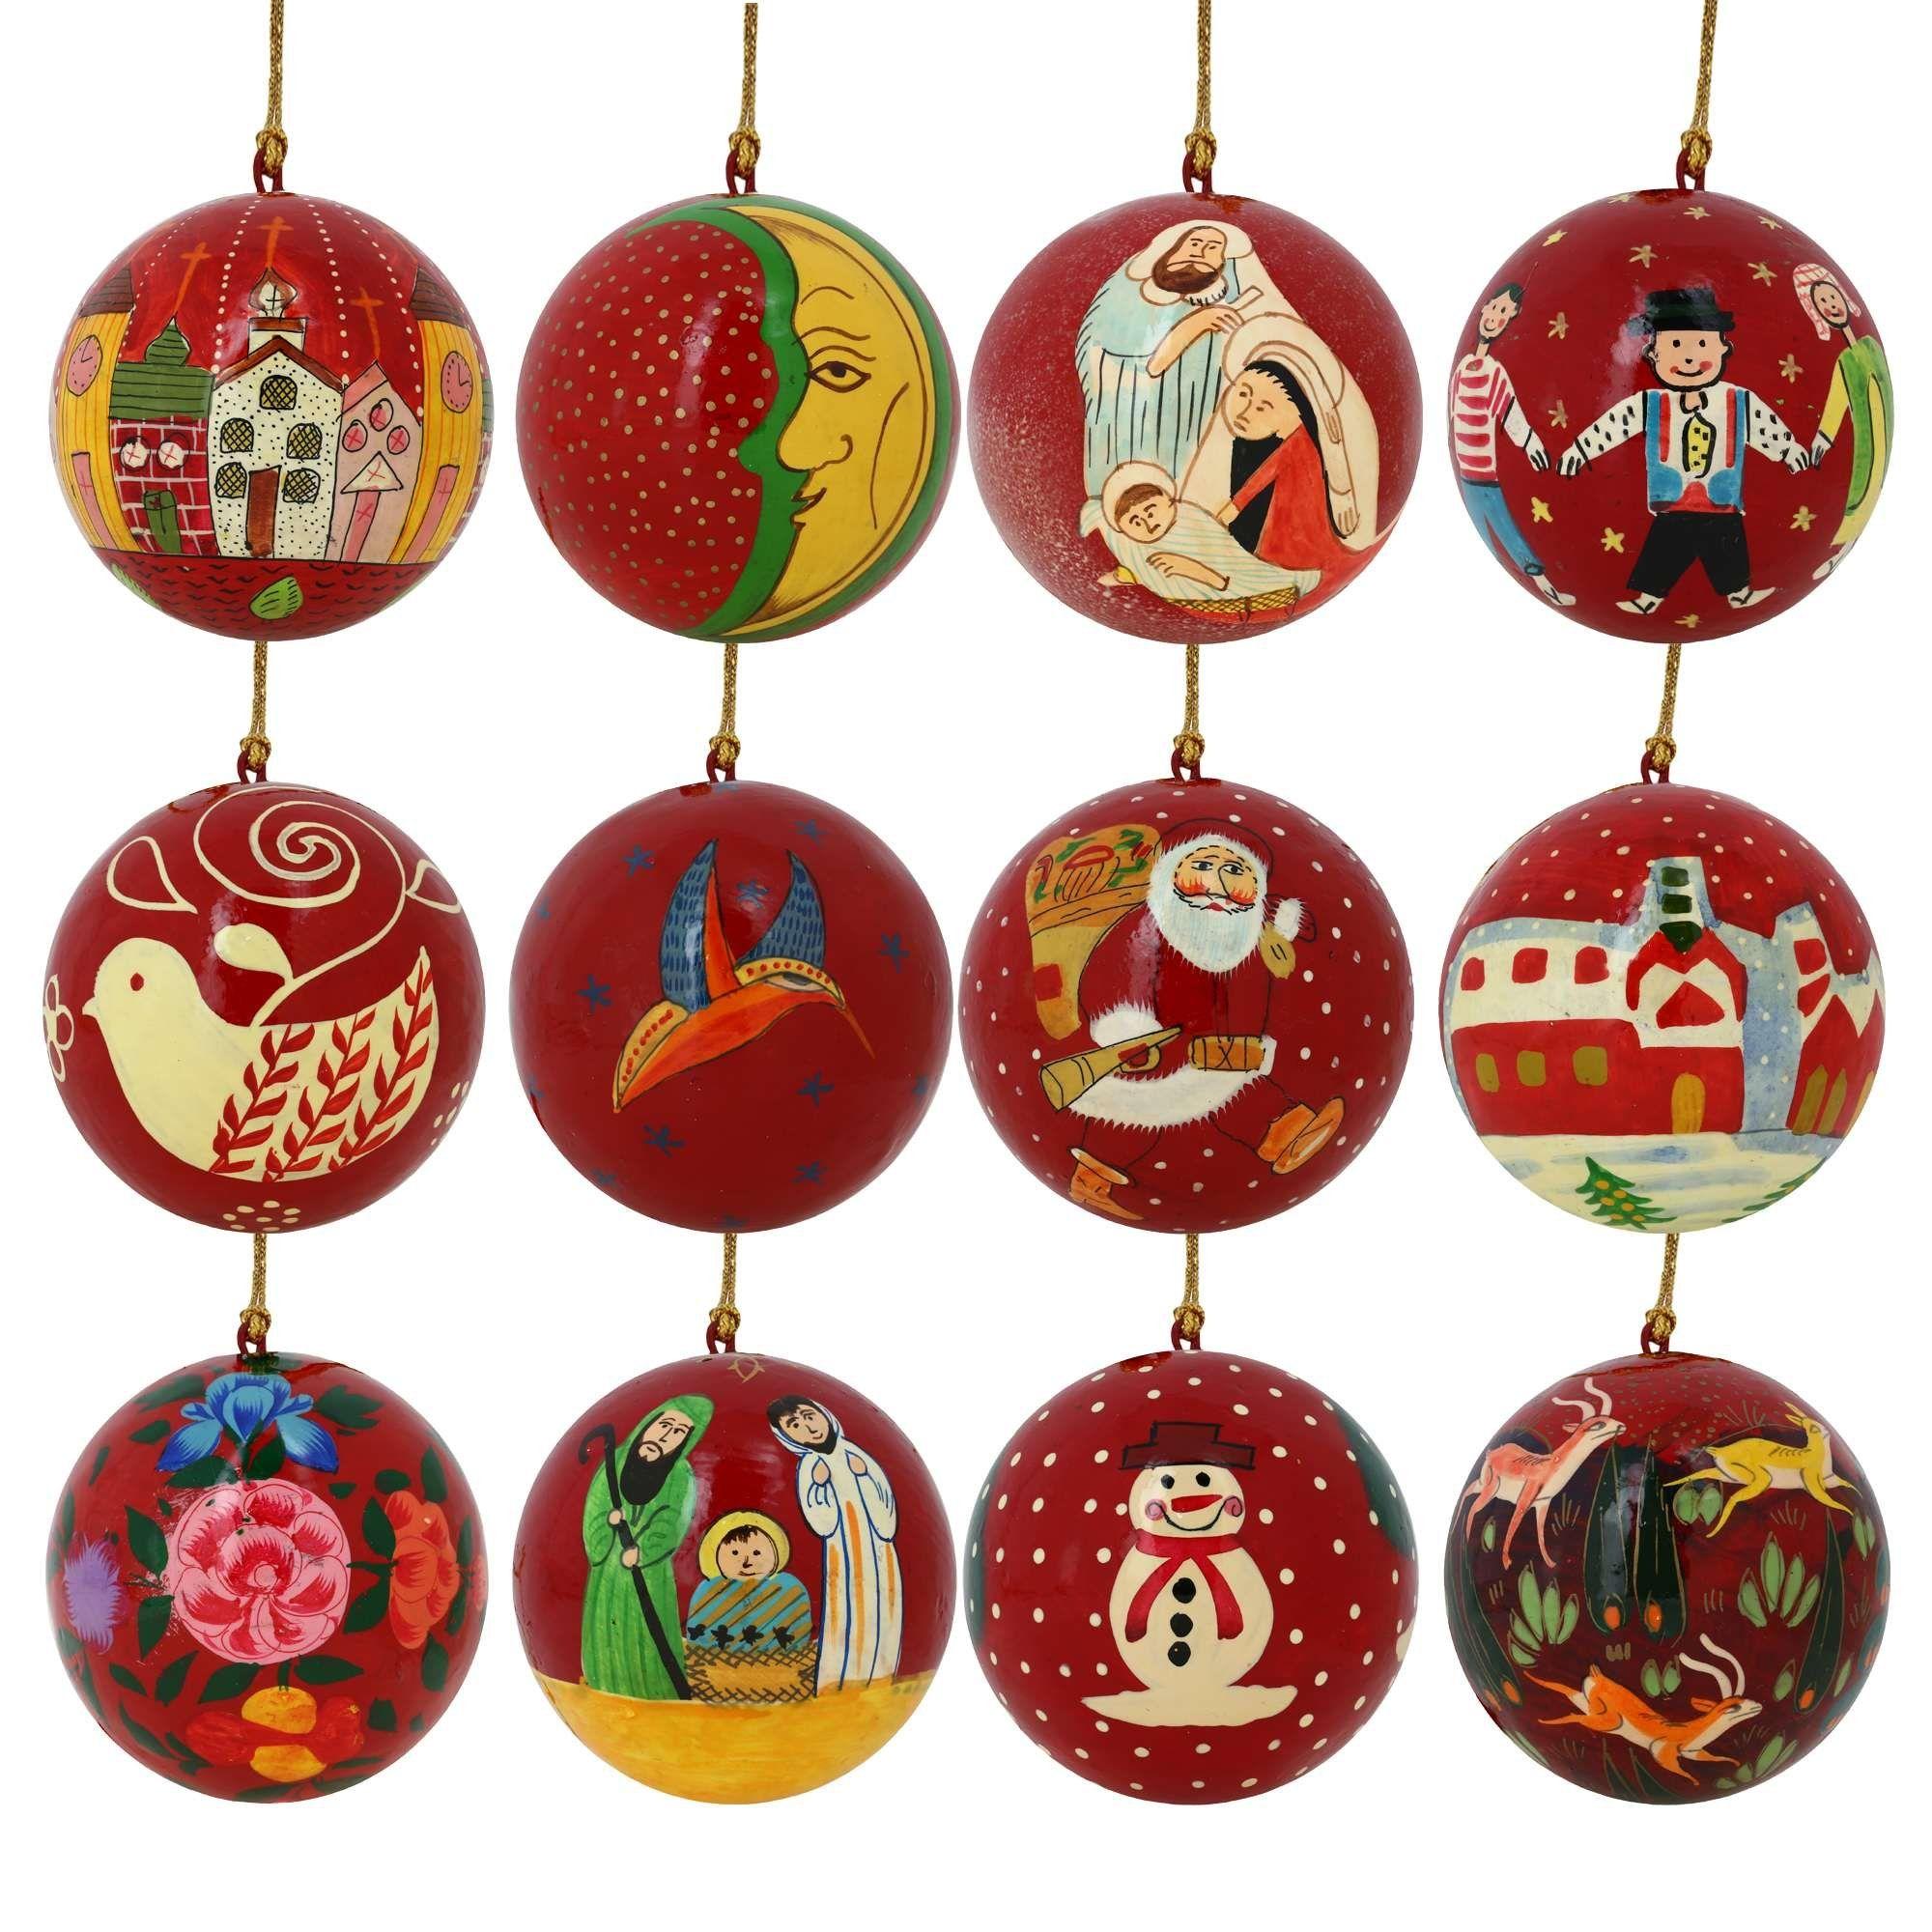 Amazon Com Set Of 12 Bright Red Paper Mache Christmas Ornaments Handmade In Kashmi Handmade Christmas Ornaments Red Christmas Ornaments Paper Mache Christmas